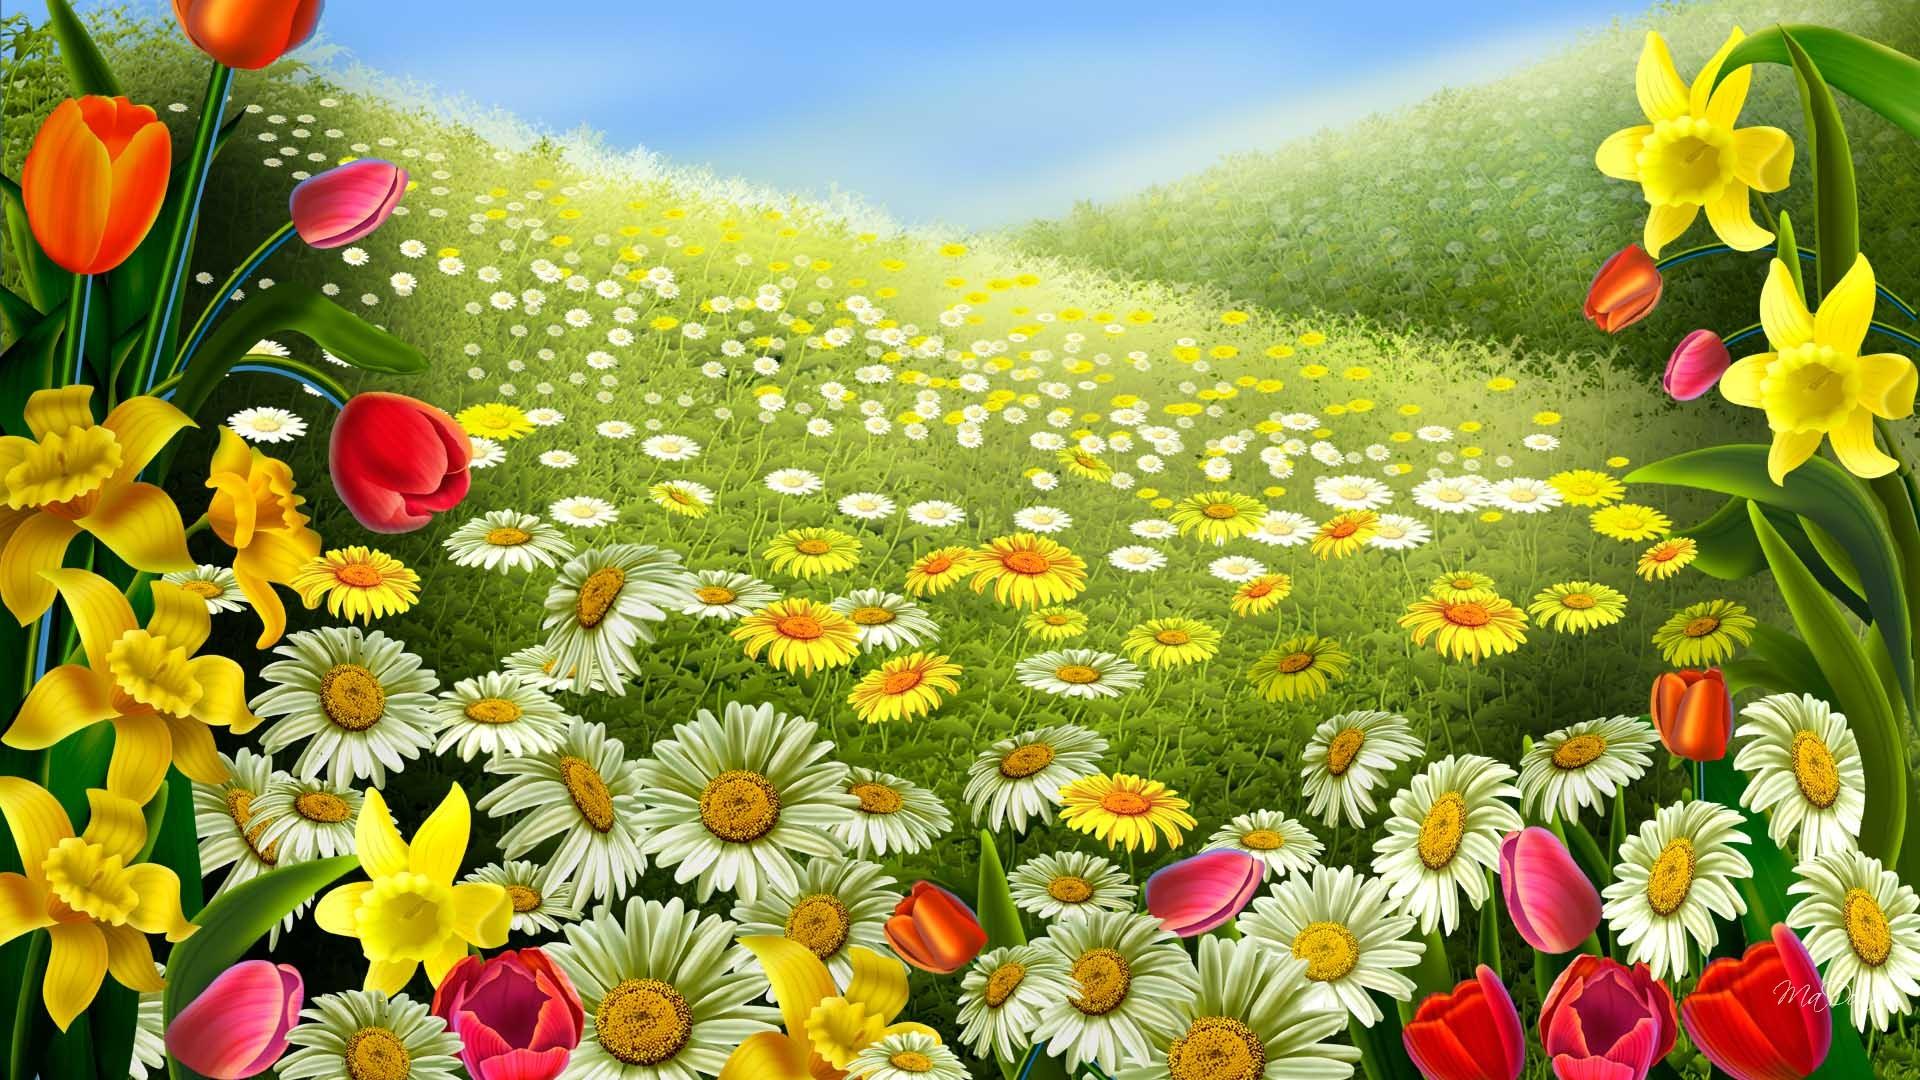 spring hd wallpapers ImageBankbiz 1920x1080